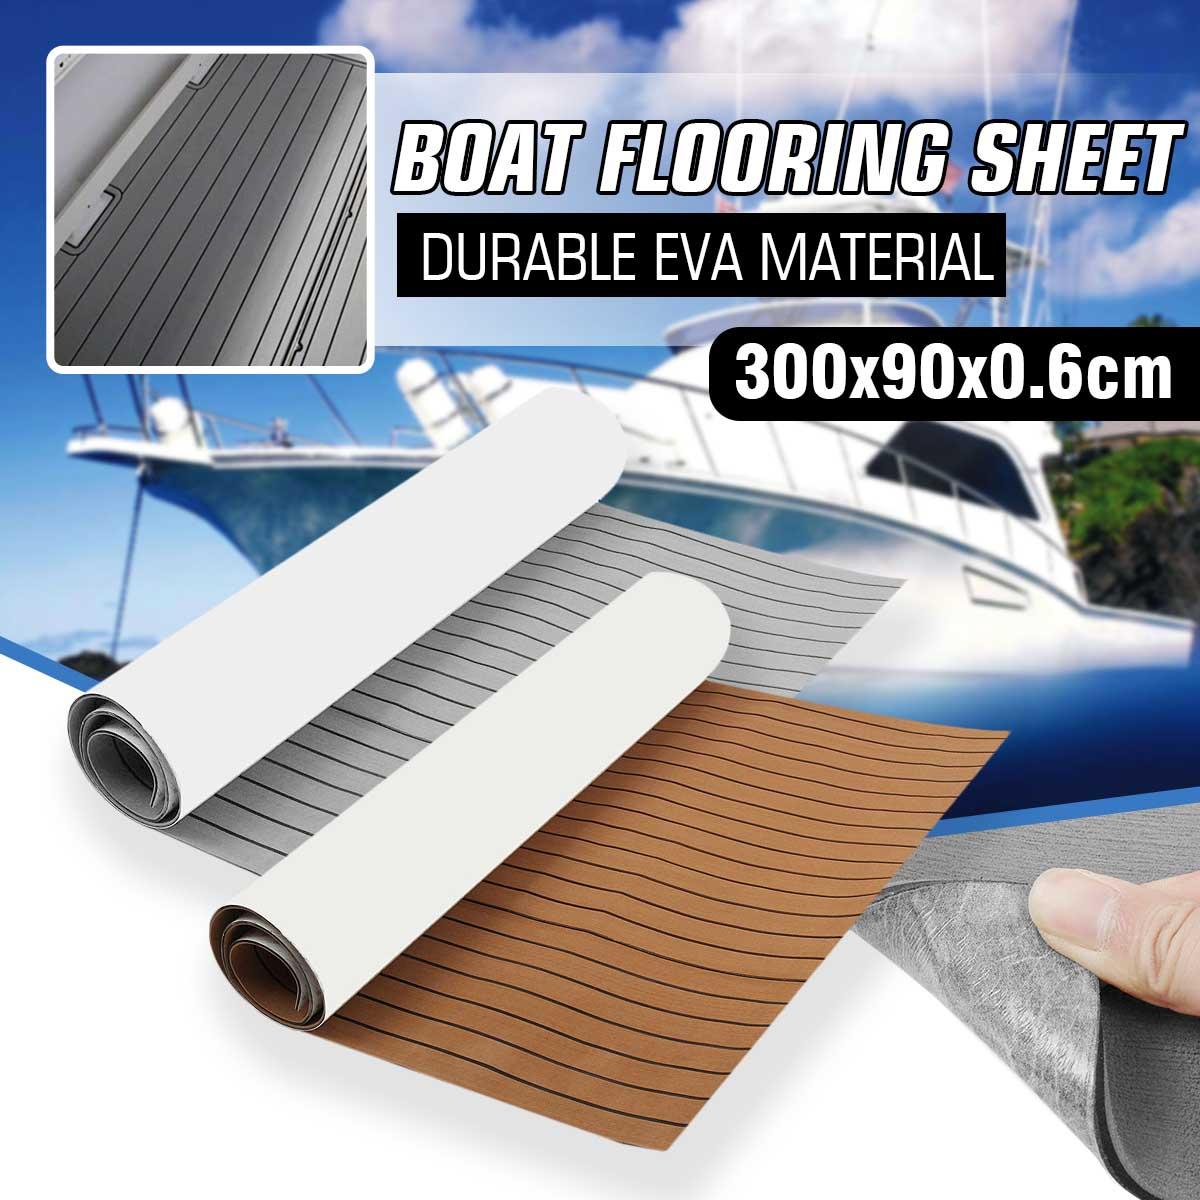 1 Roll 300x90x0.6cm Self-Adhesive EVA Foam Boat Yacht RV Caravan Marine Flooring Faux Teak Boat Decking Sheet Floor Decor Mat